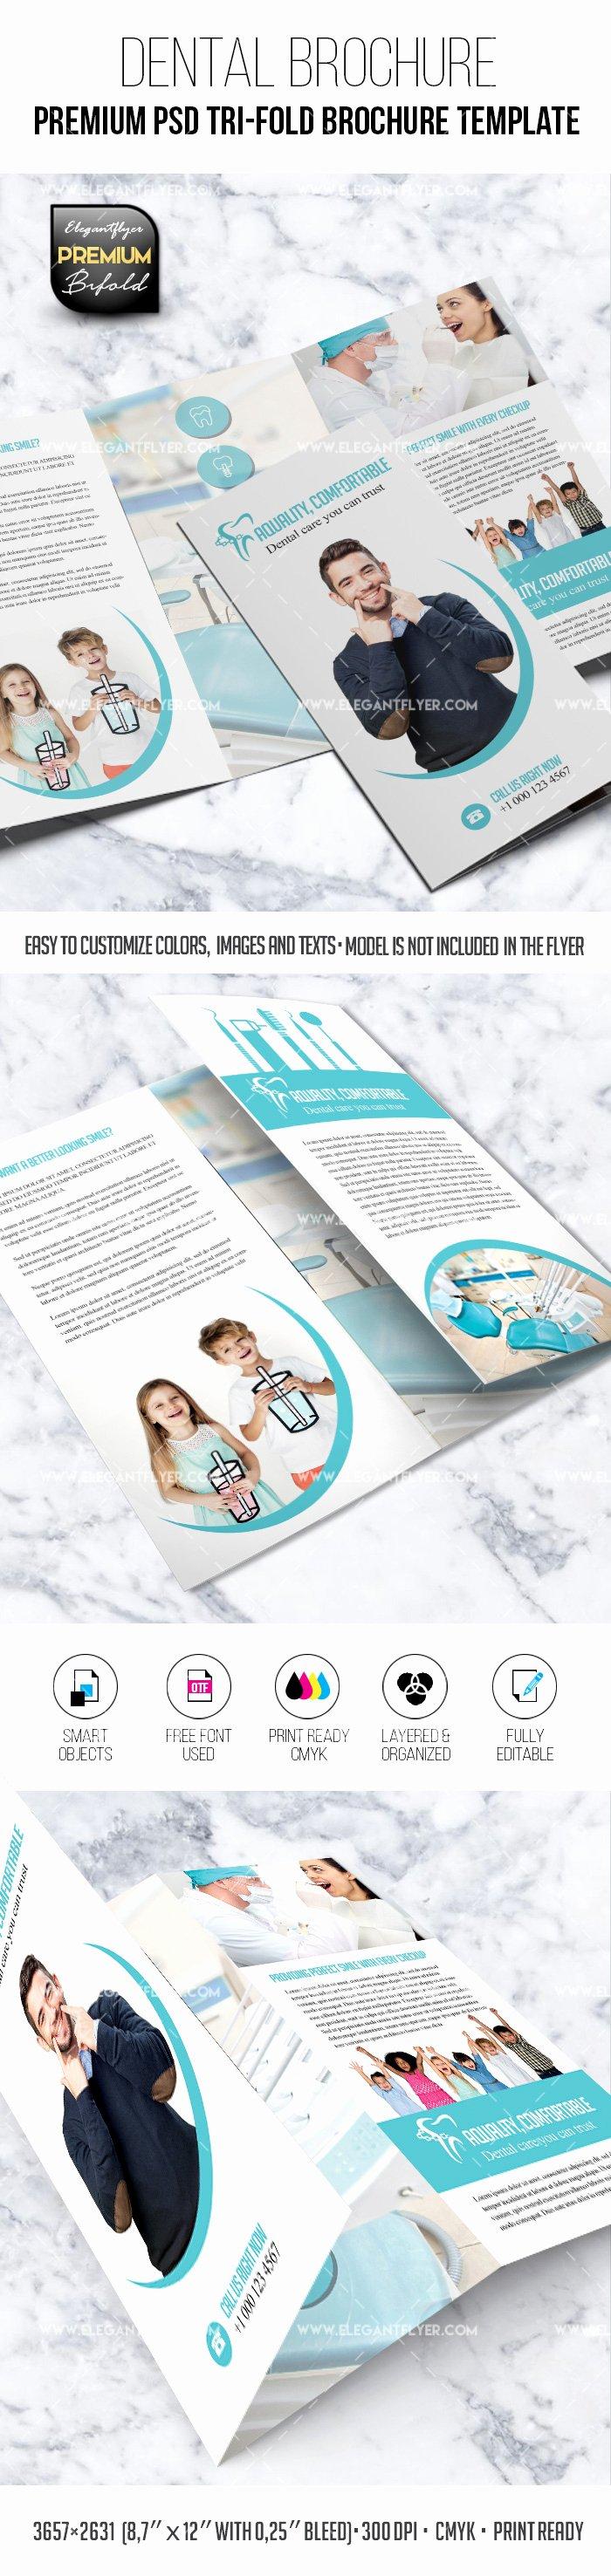 Tri Fold Brochure Template Psd Fresh Dental – Tri Fold Brochure Psd Template – by Elegantflyer